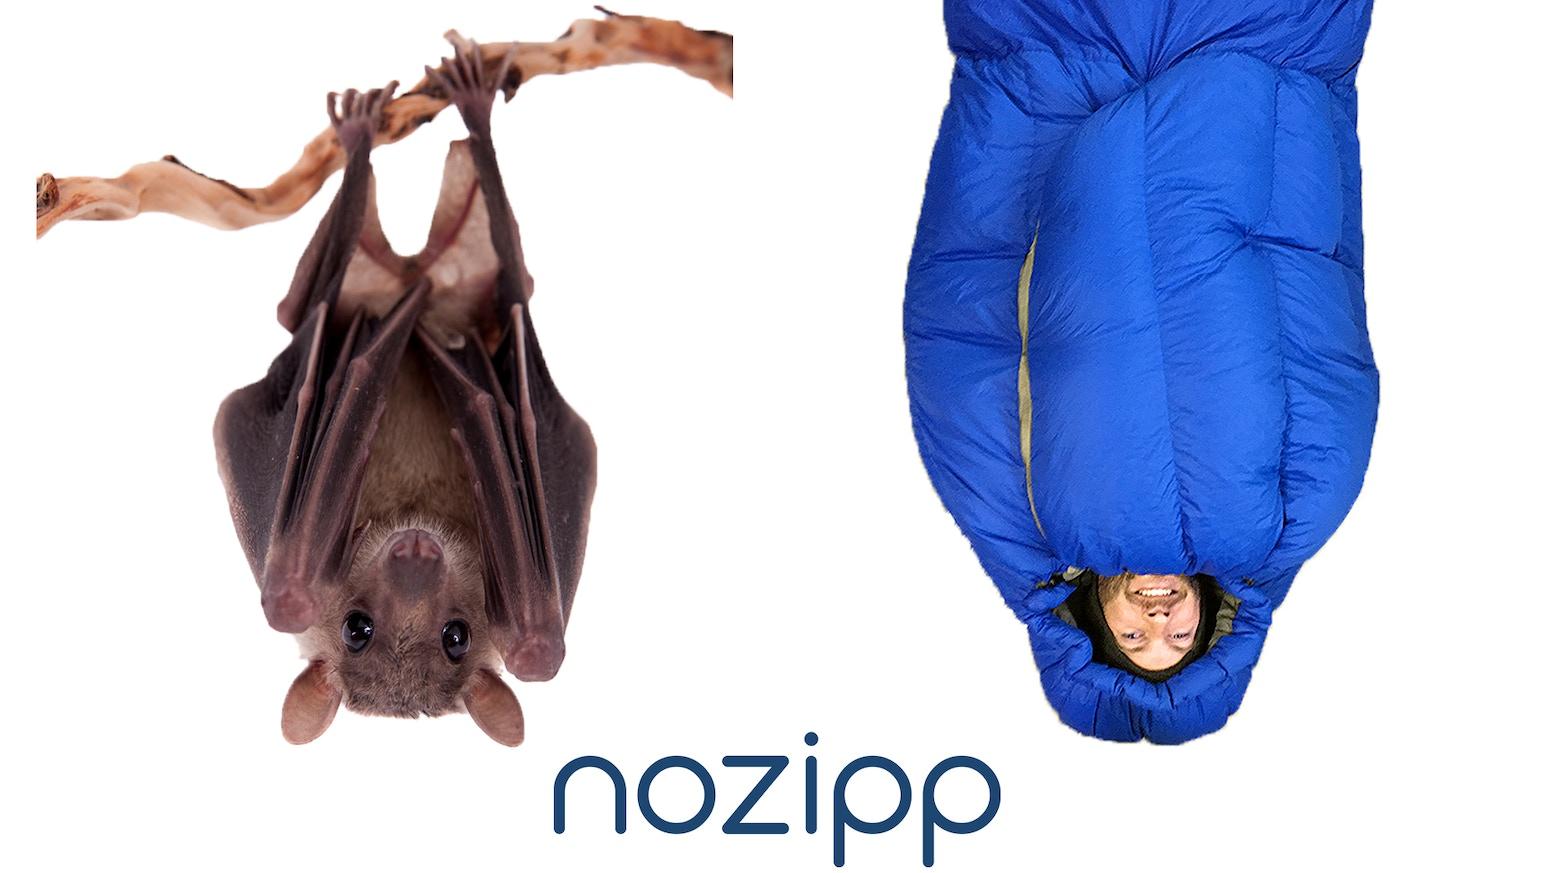 An innovative zipperless design. Effortless entry, wide-ranging temperature control, and enhanced comfort.